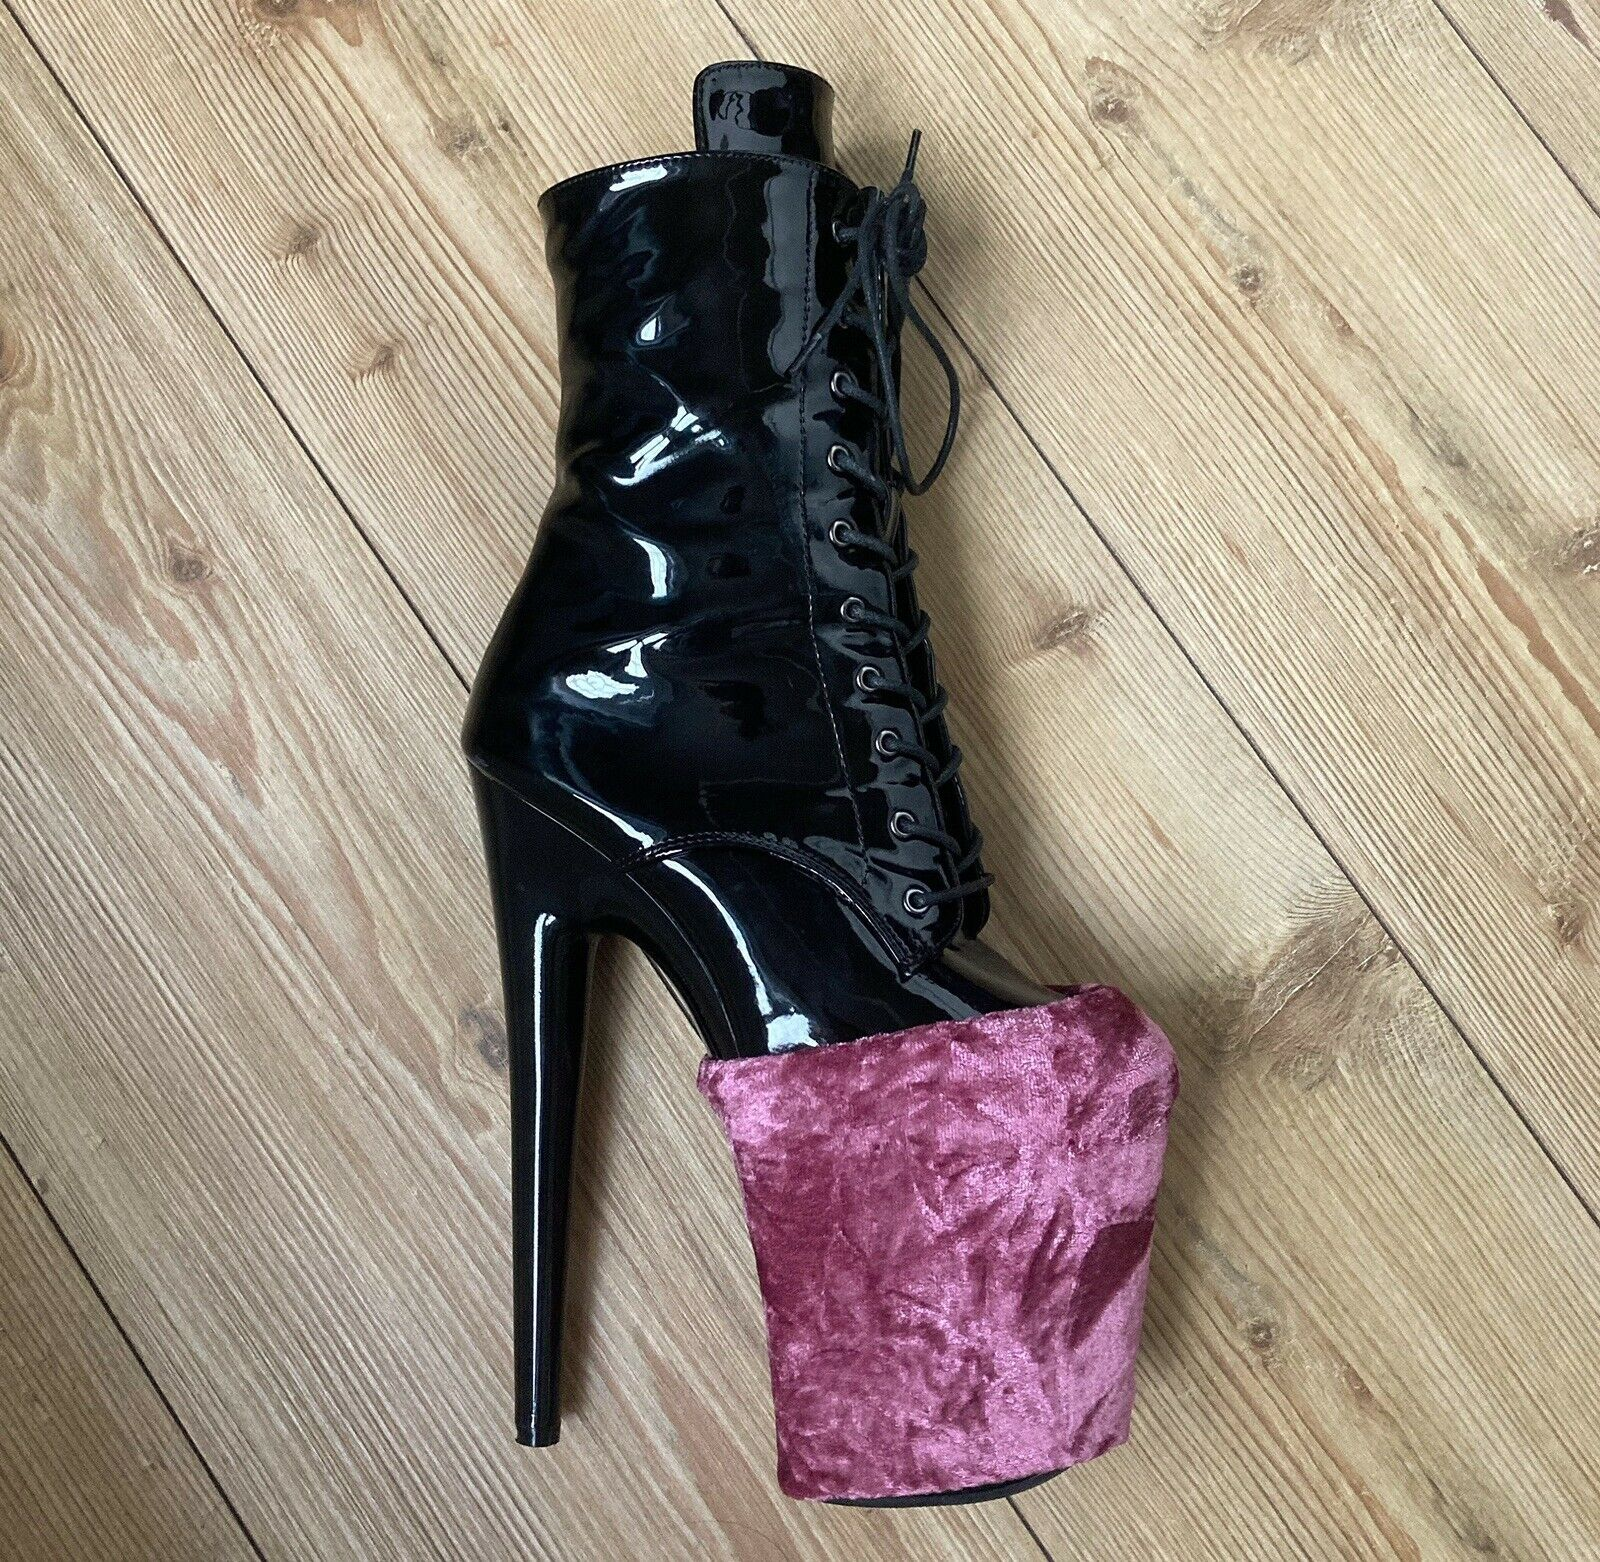 Rose Pink Crushed Velvet Exotic Pole Dancing Pleaser Heel Cover Protectors